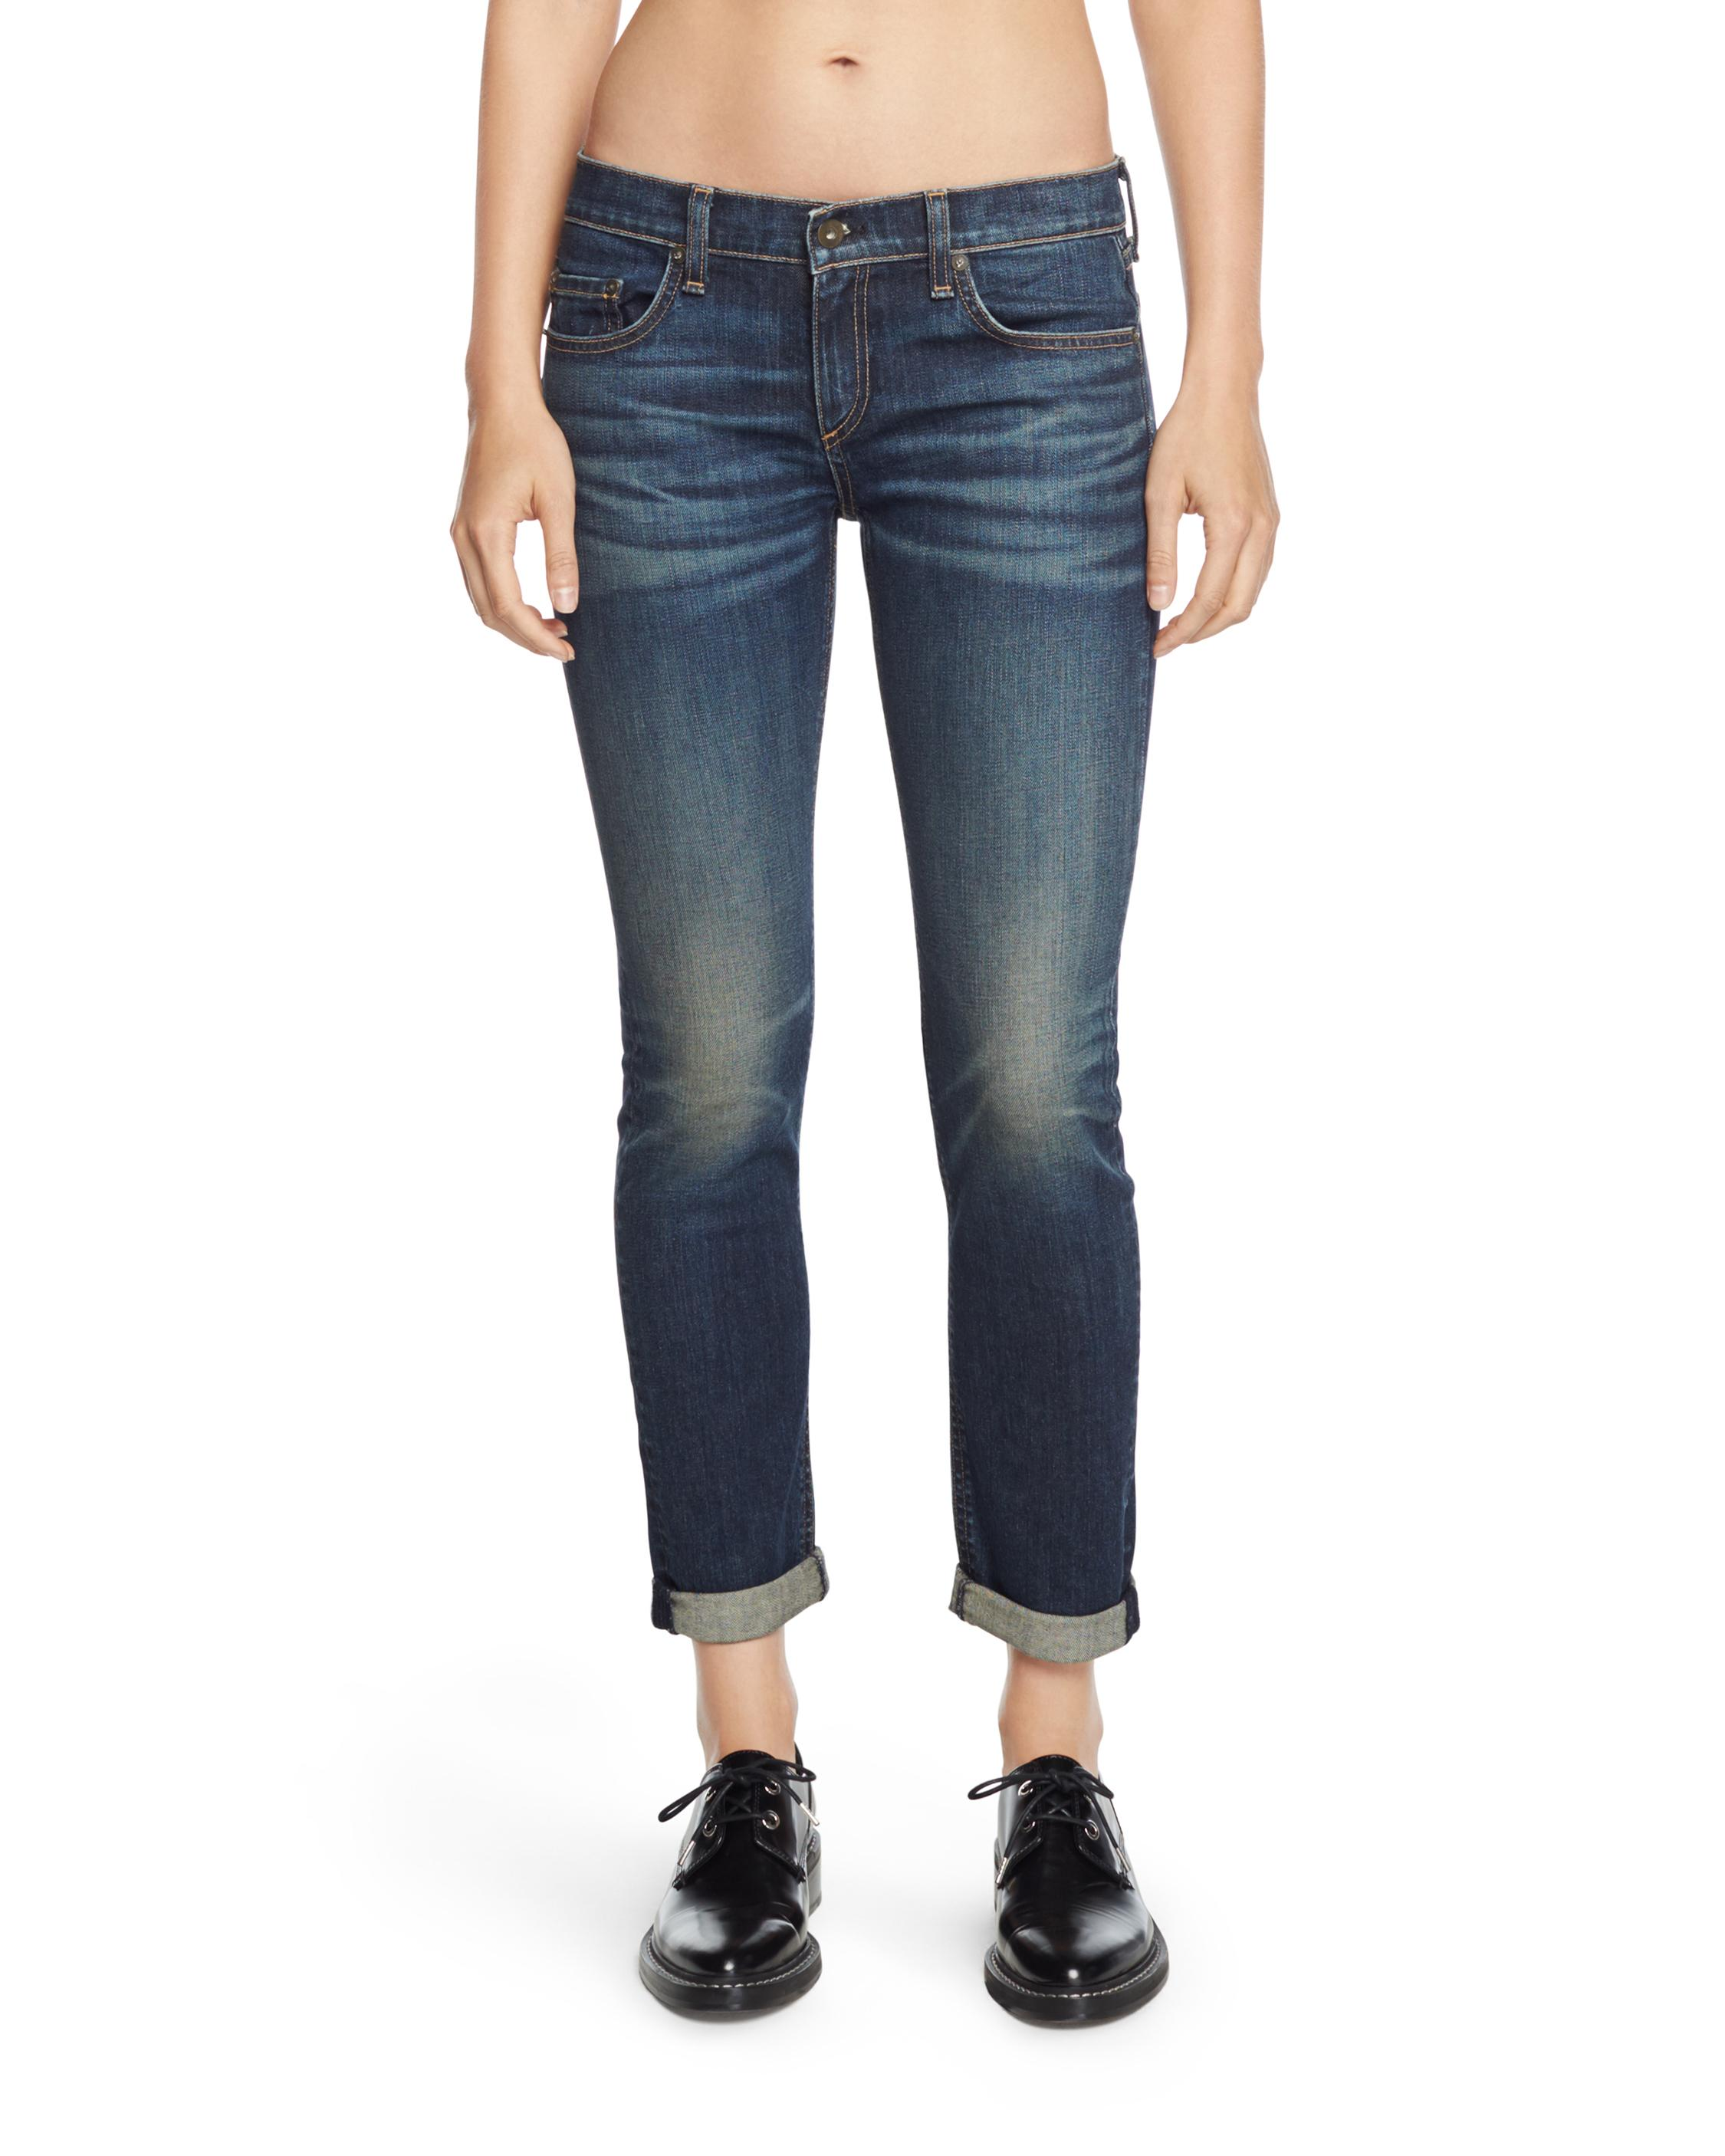 The Cheapest Rag & Bone Mid-Rise Wool Pants 2018 Newest Cheap Online Cheap Sale Clearance Store PIK5A2fUaH